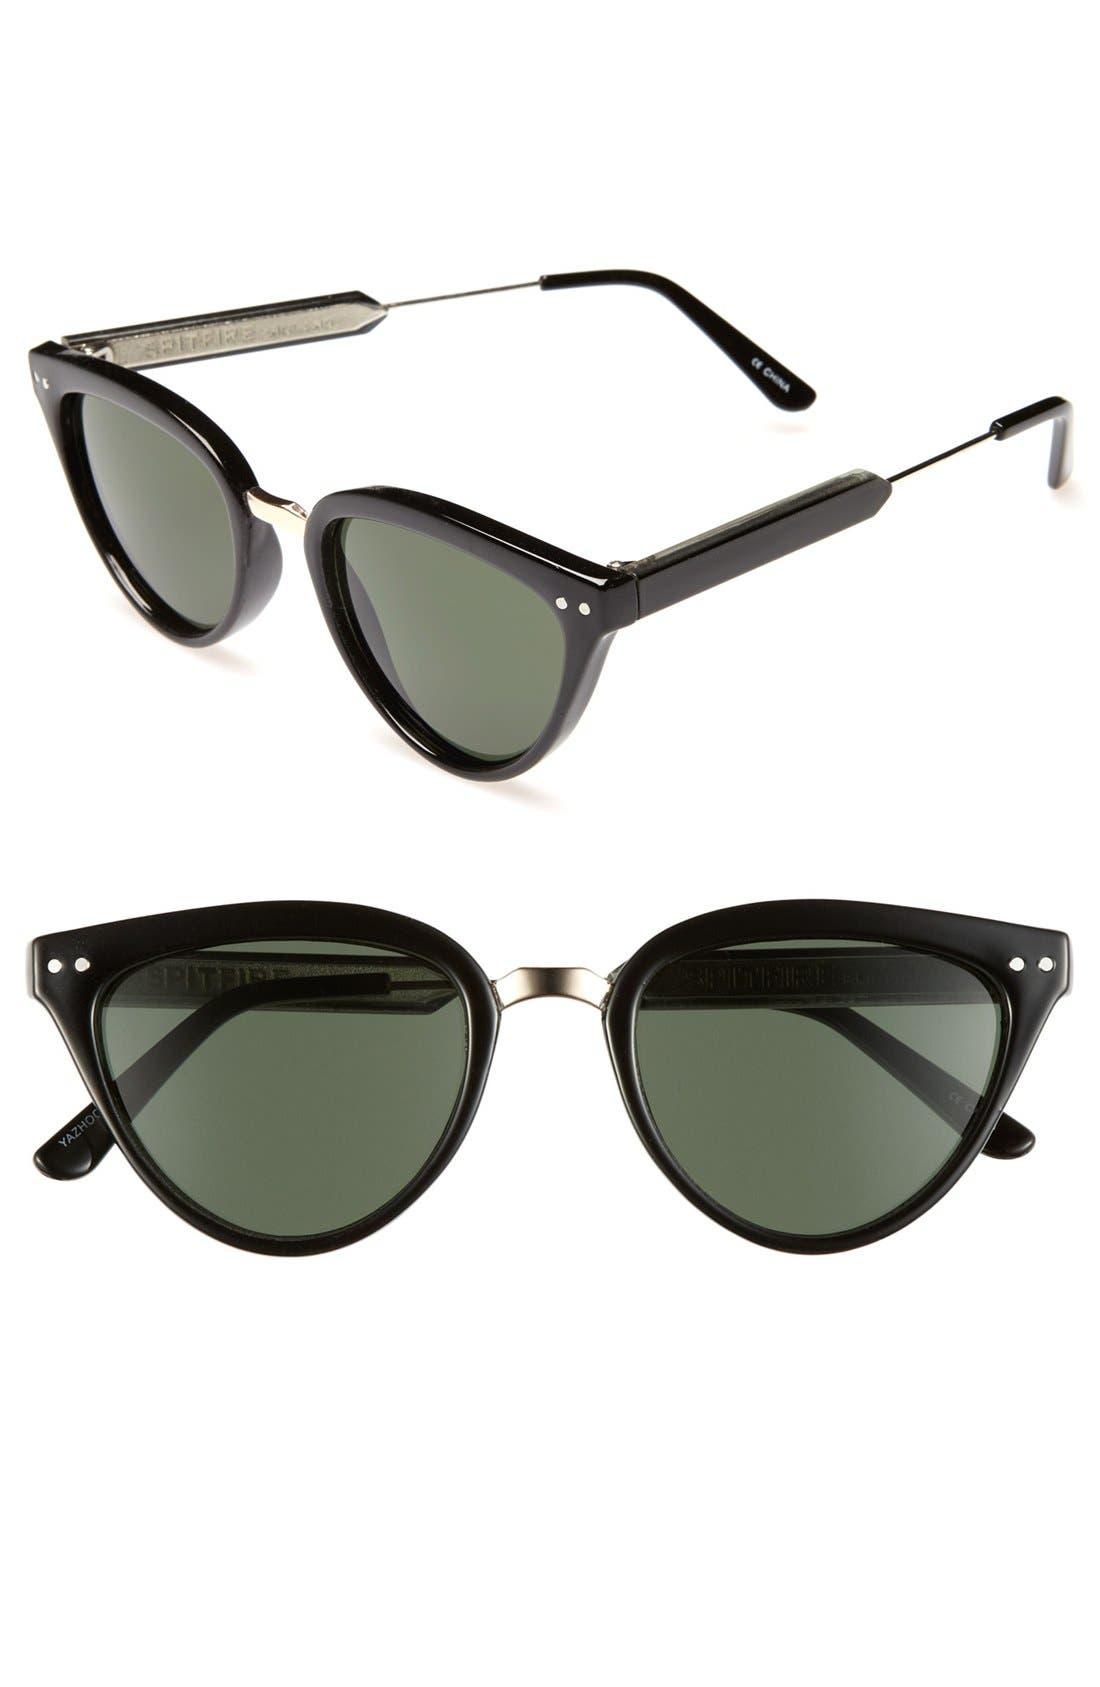 'Yazhoo' 50mm Sunglasses,                         Main,                         color, Black/ Black